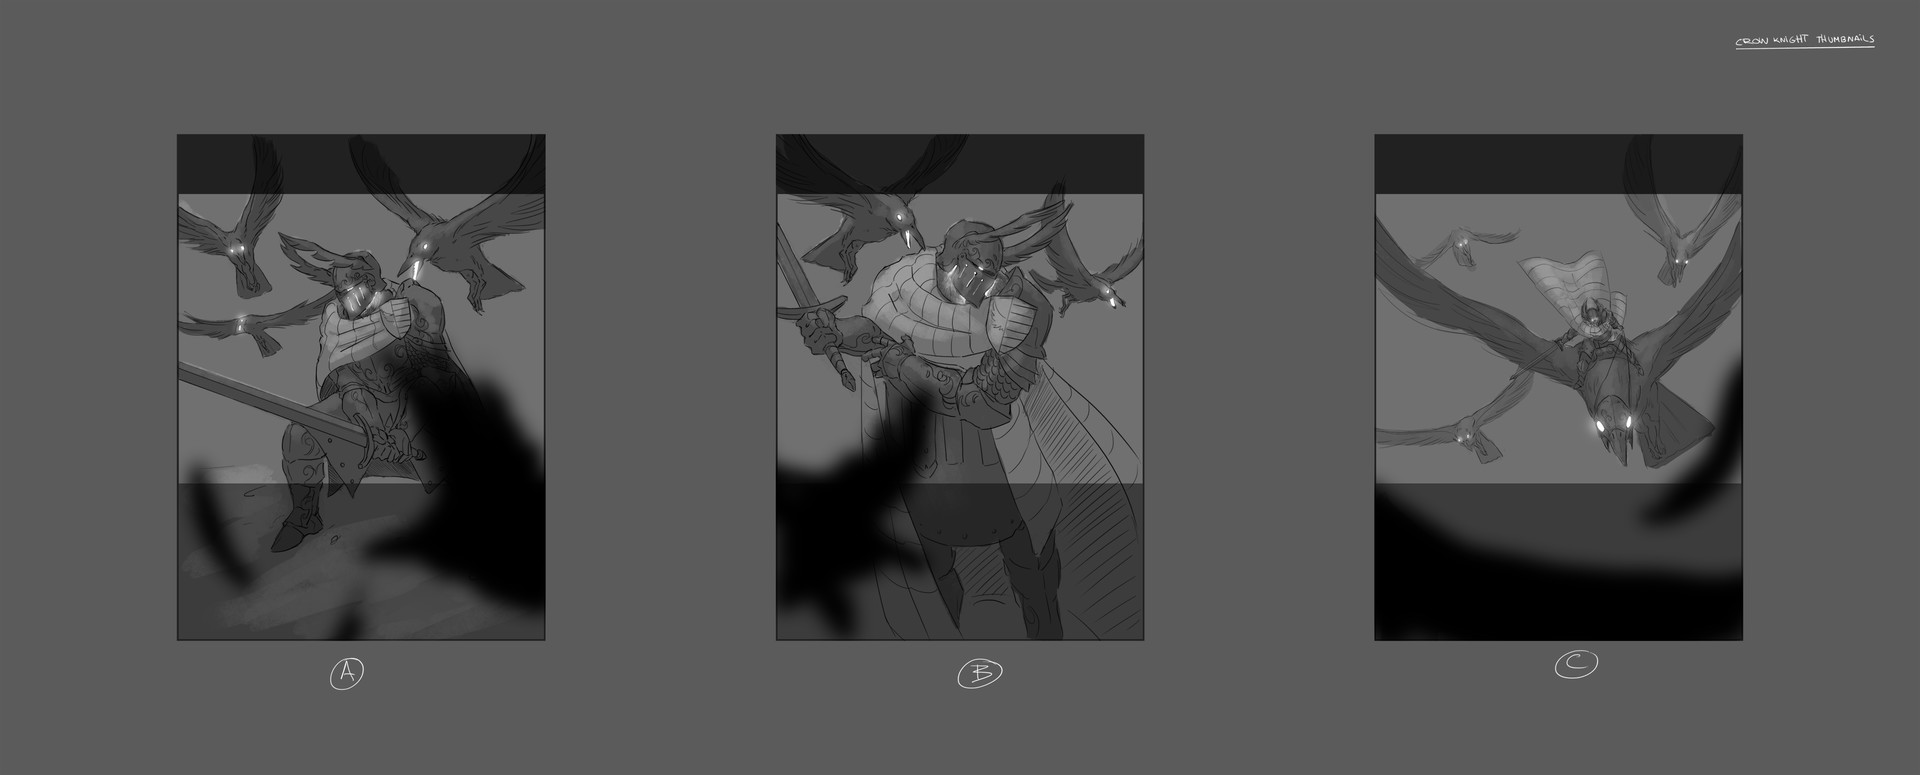 Ricardo coelho crow knight thumbnails 01